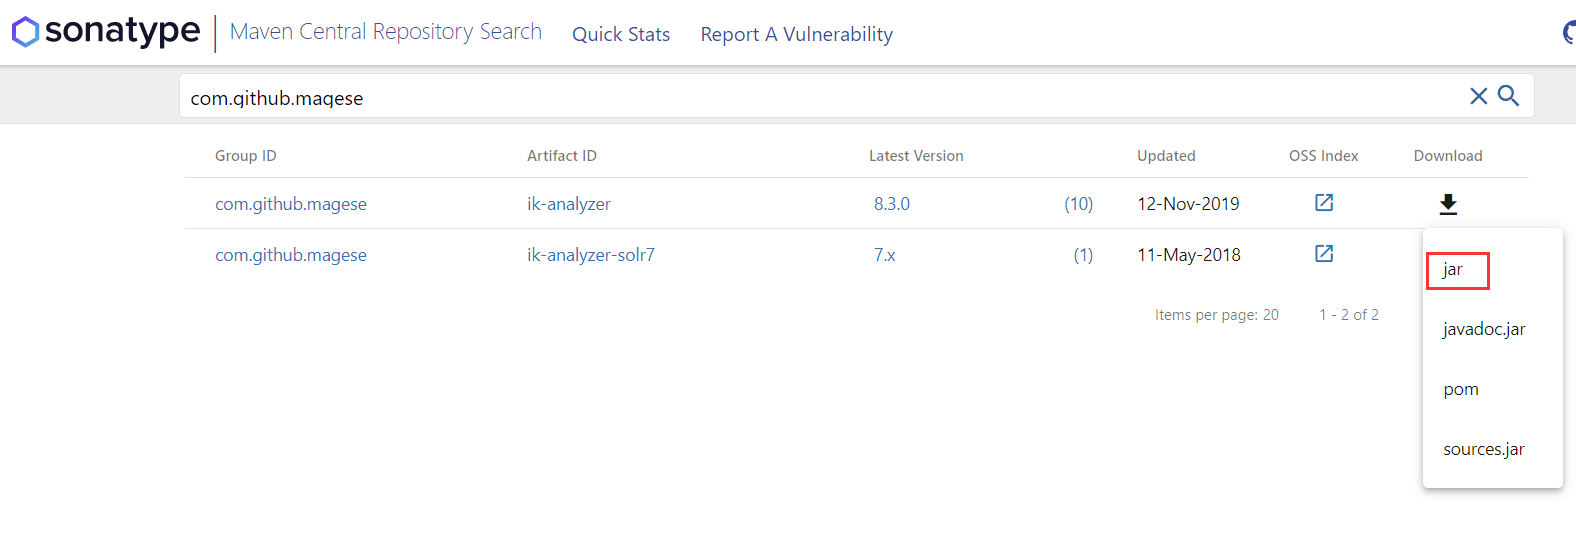 solr8.6.2 客户端界面介绍及配置中文分词器